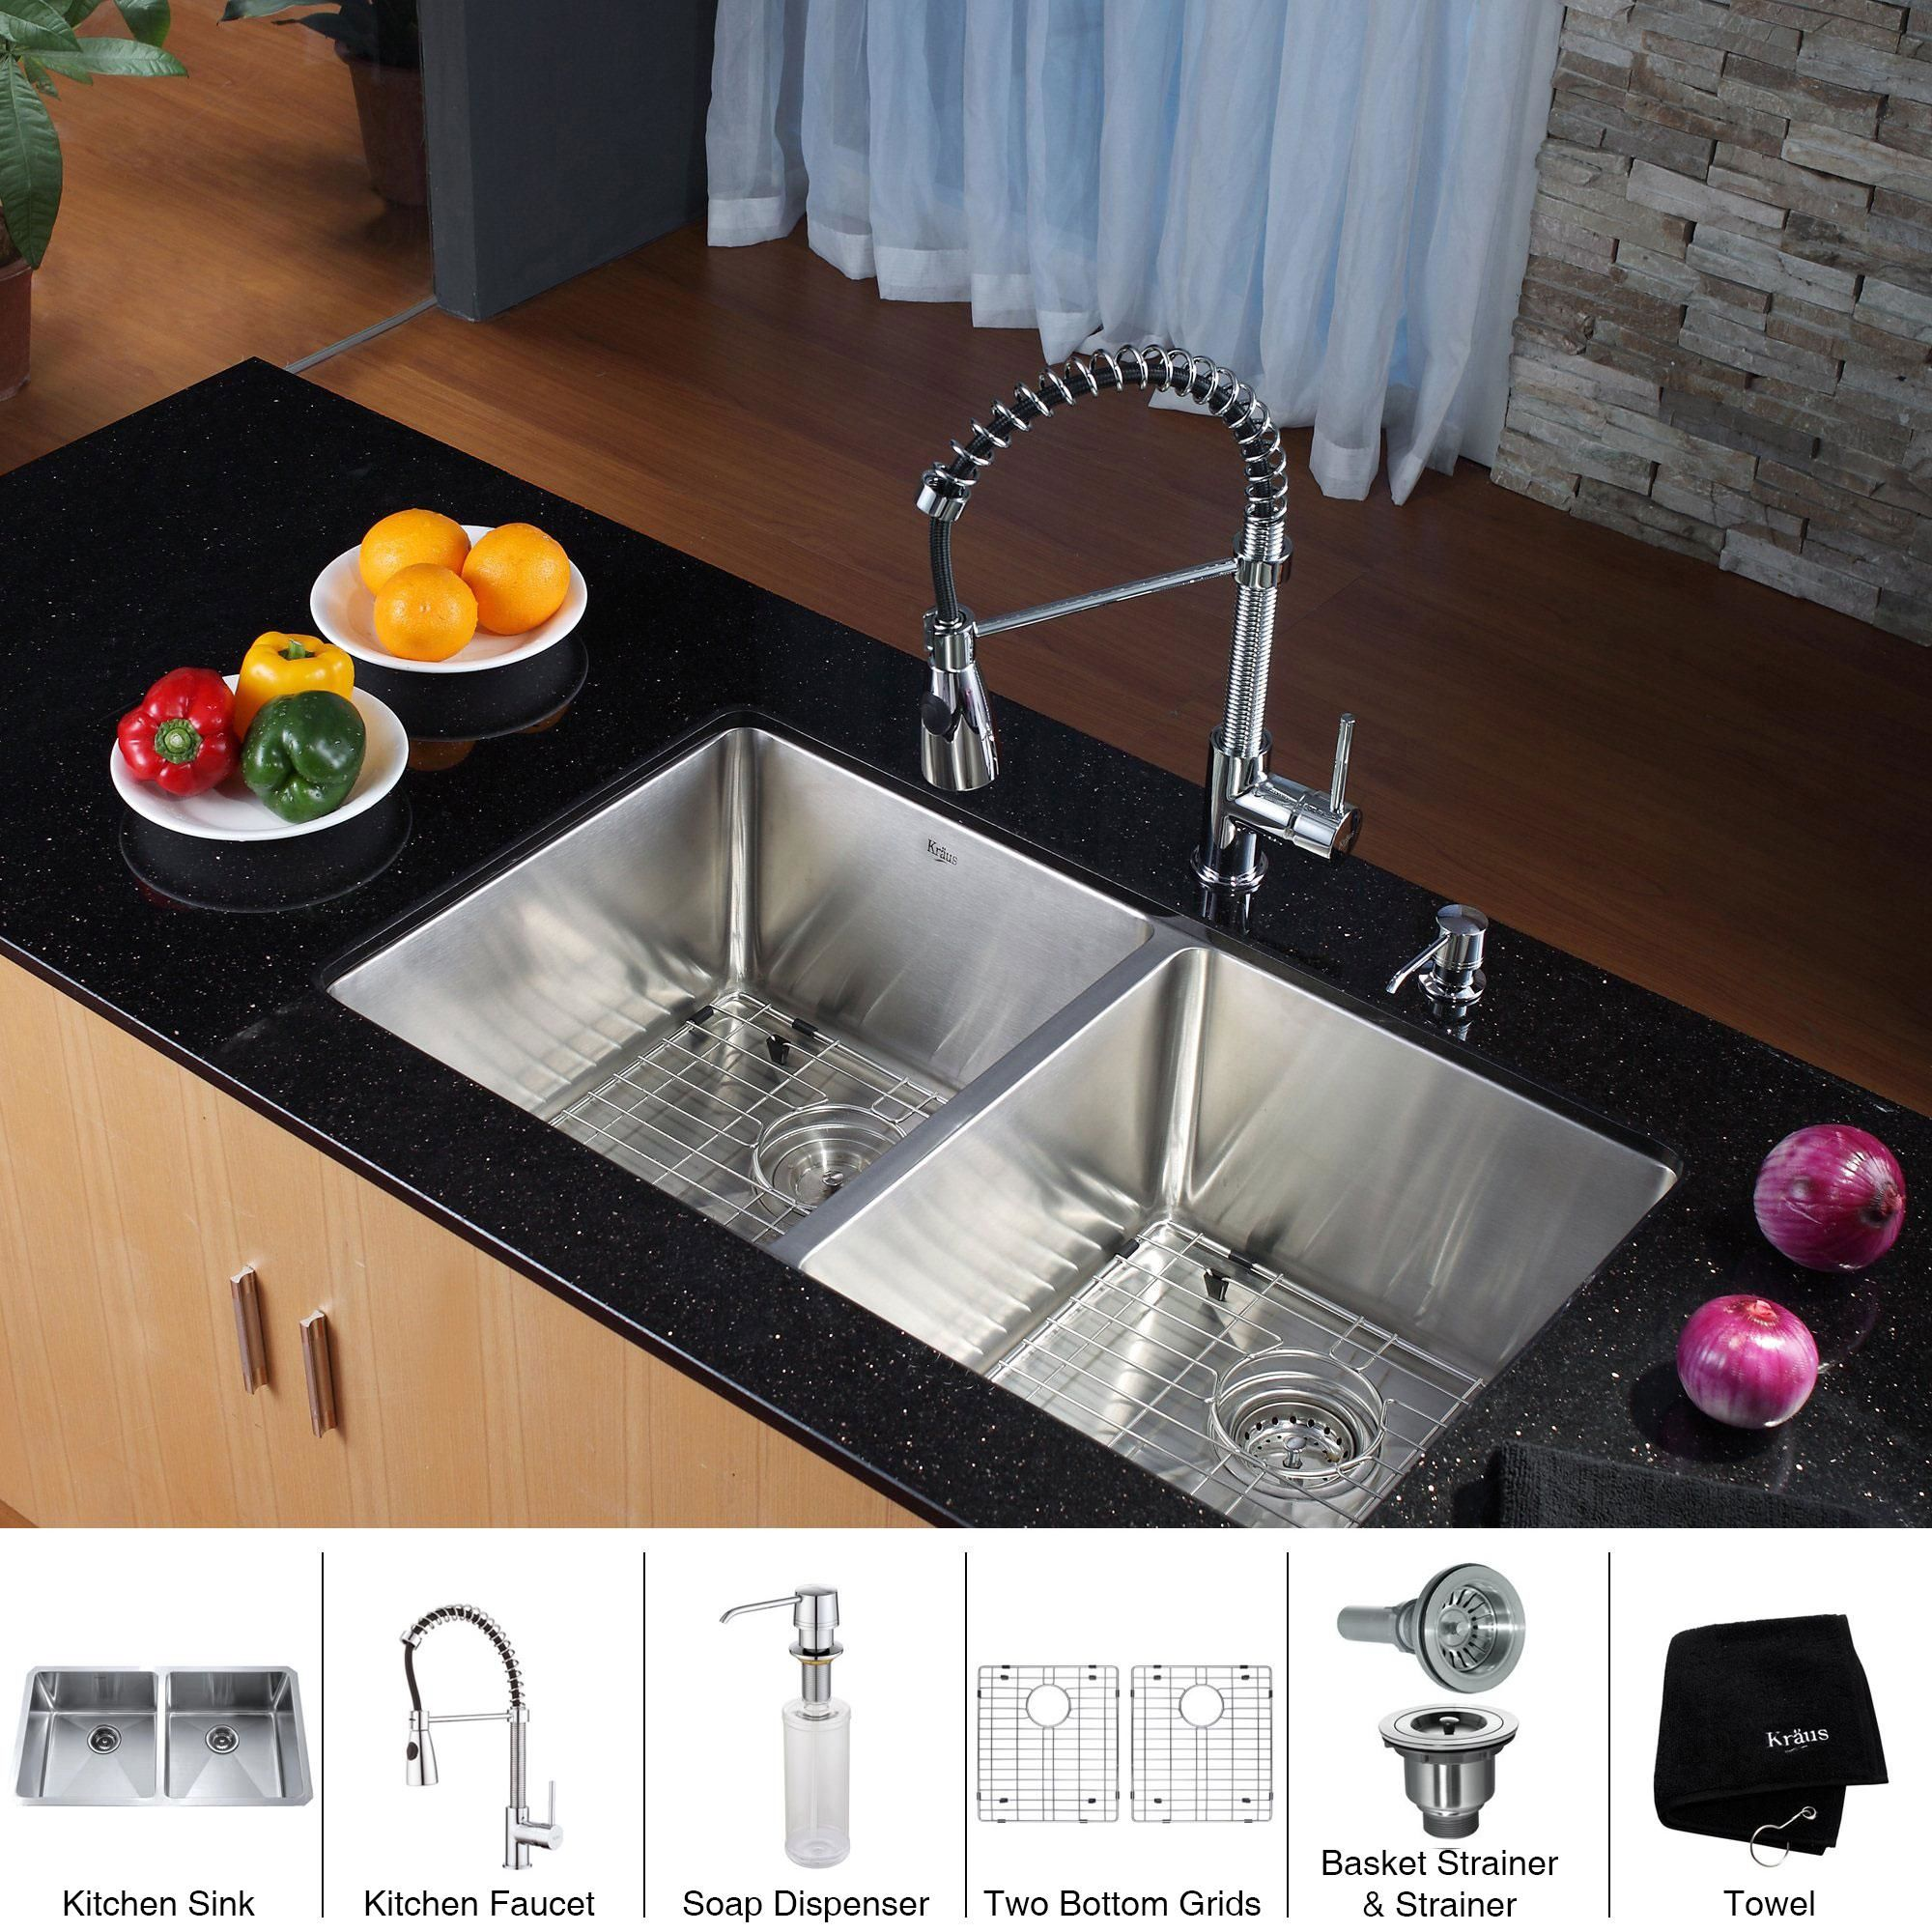 steel bination sink new kitchen sets gratograt stainless photos nola and of images single faucets faucet kraus kpf kraususa elegant